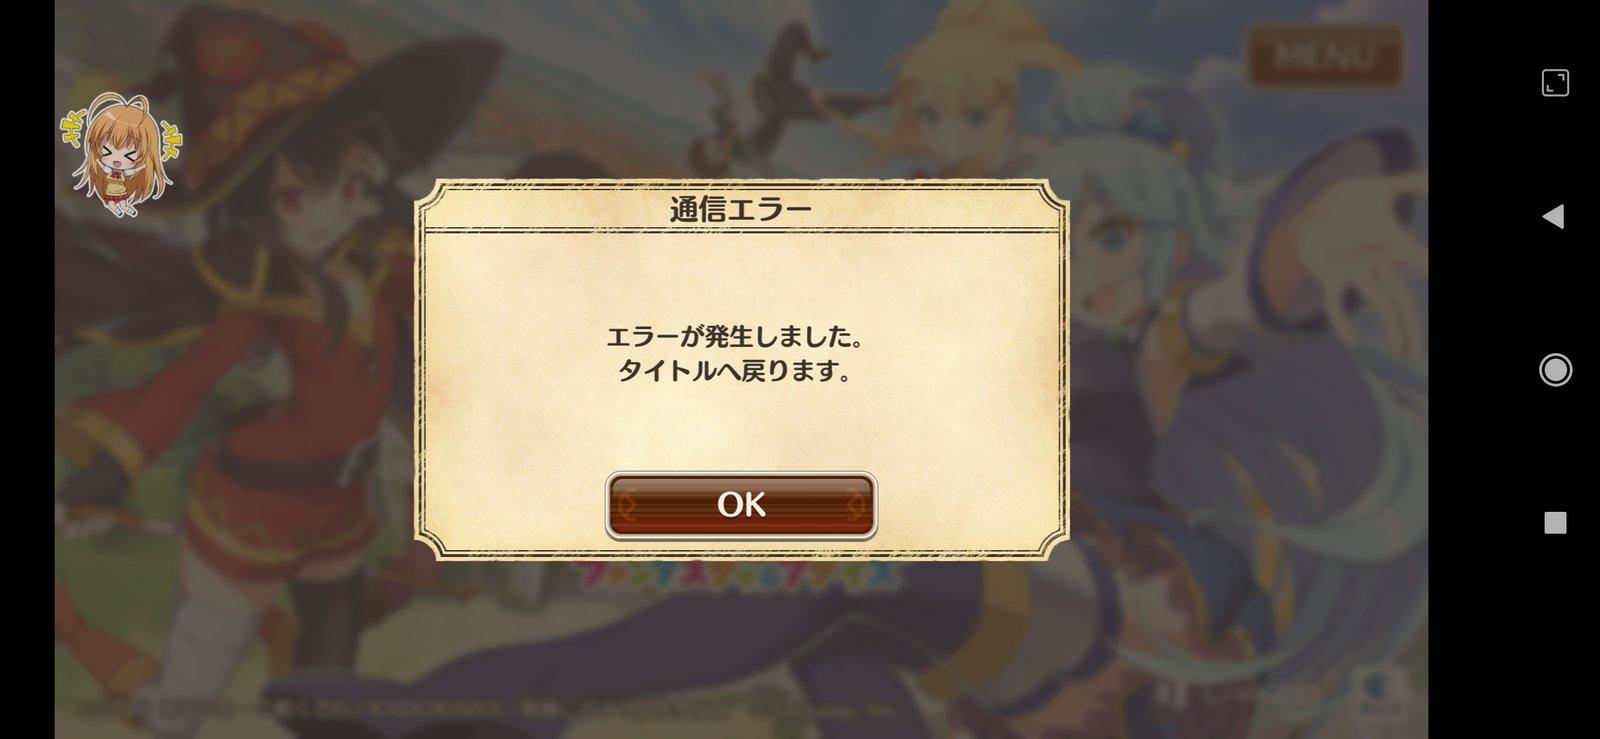 Screenshot_2020-09-10-07-16-24-198_jp.co.sumzap.pj0007.jpg